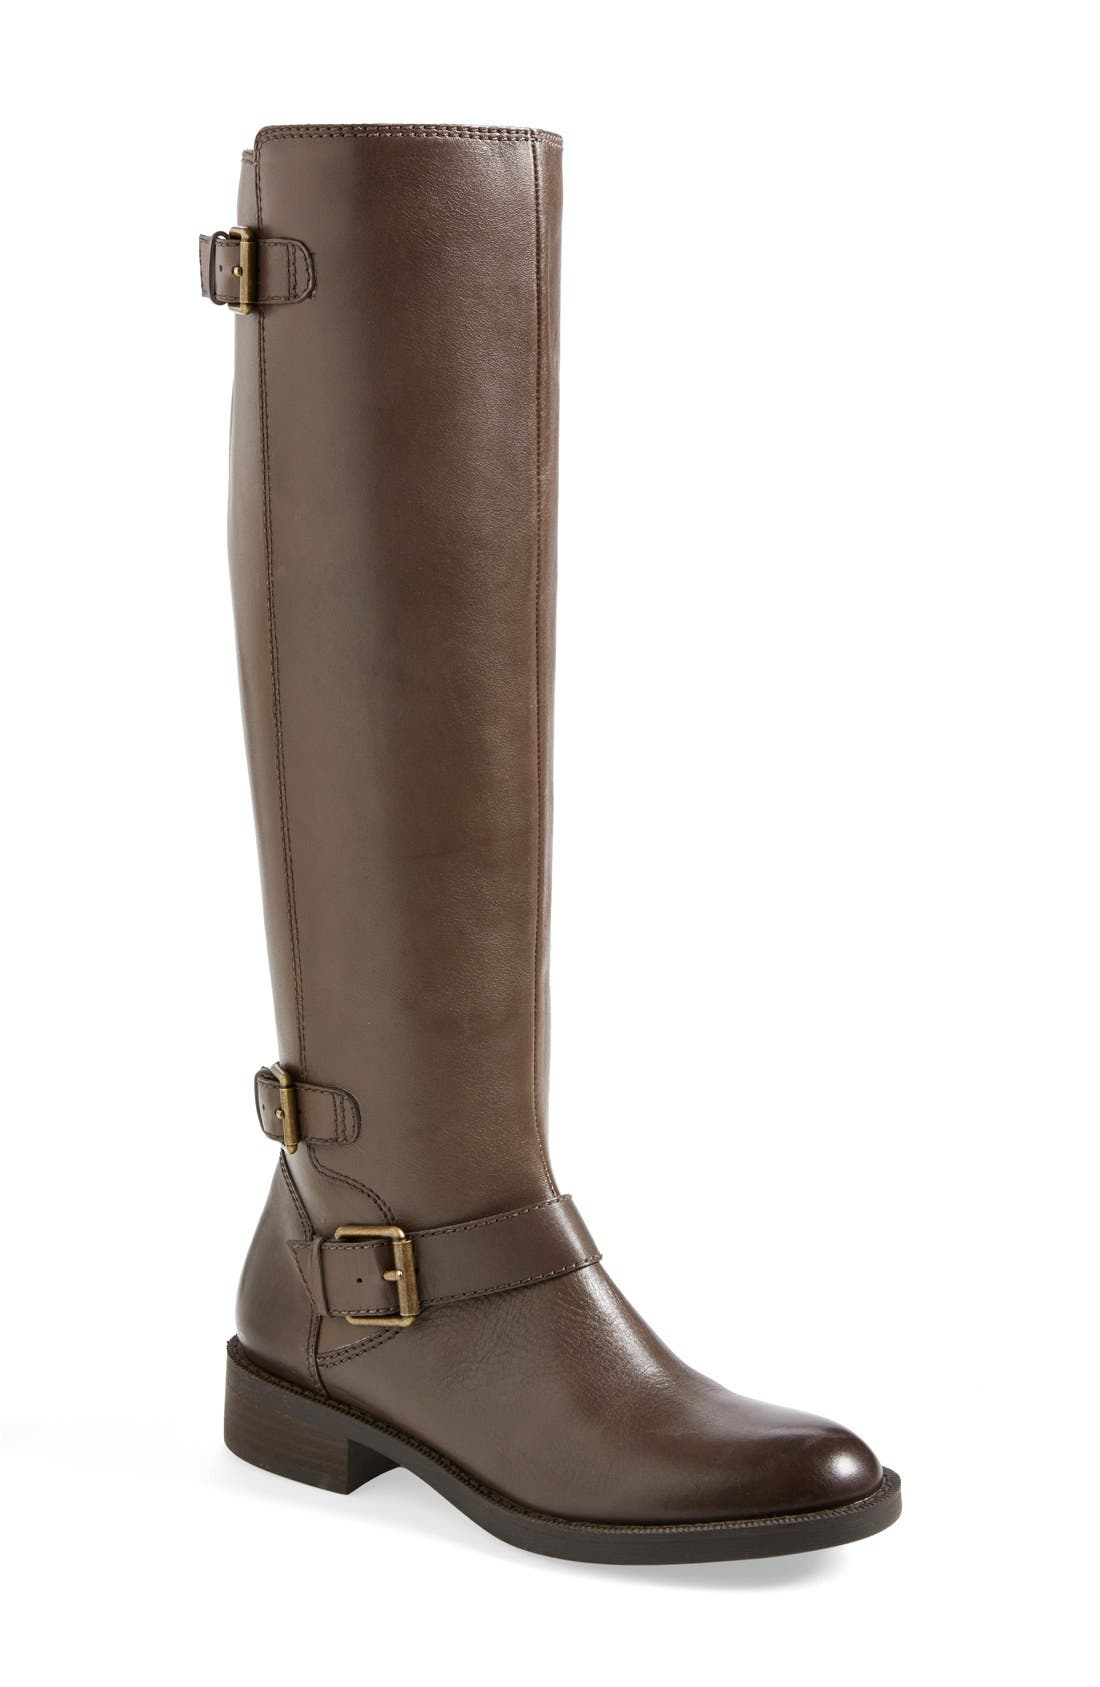 Alternate Image 1 Selected - Enzo Angiolini 'Sayin' Riding Boot (Women)